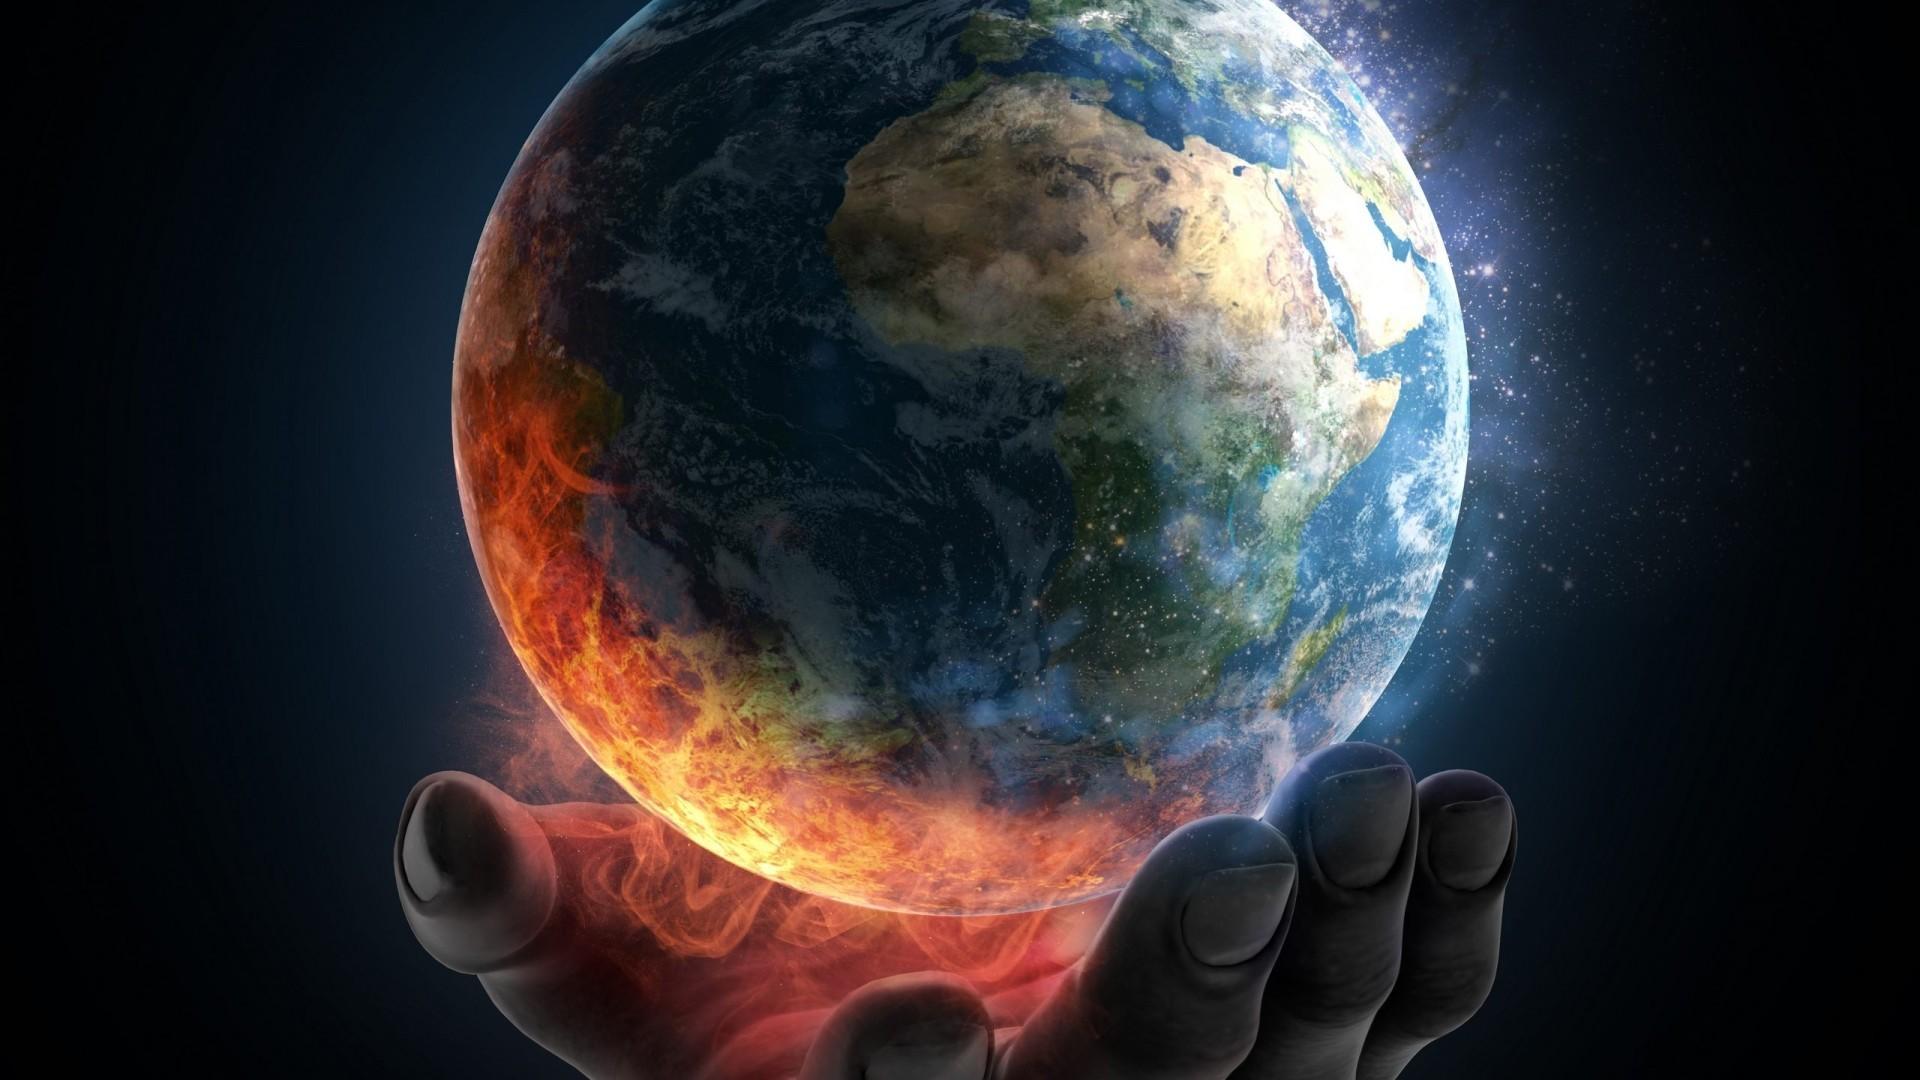 Planet Earth Destruction Wallpaper